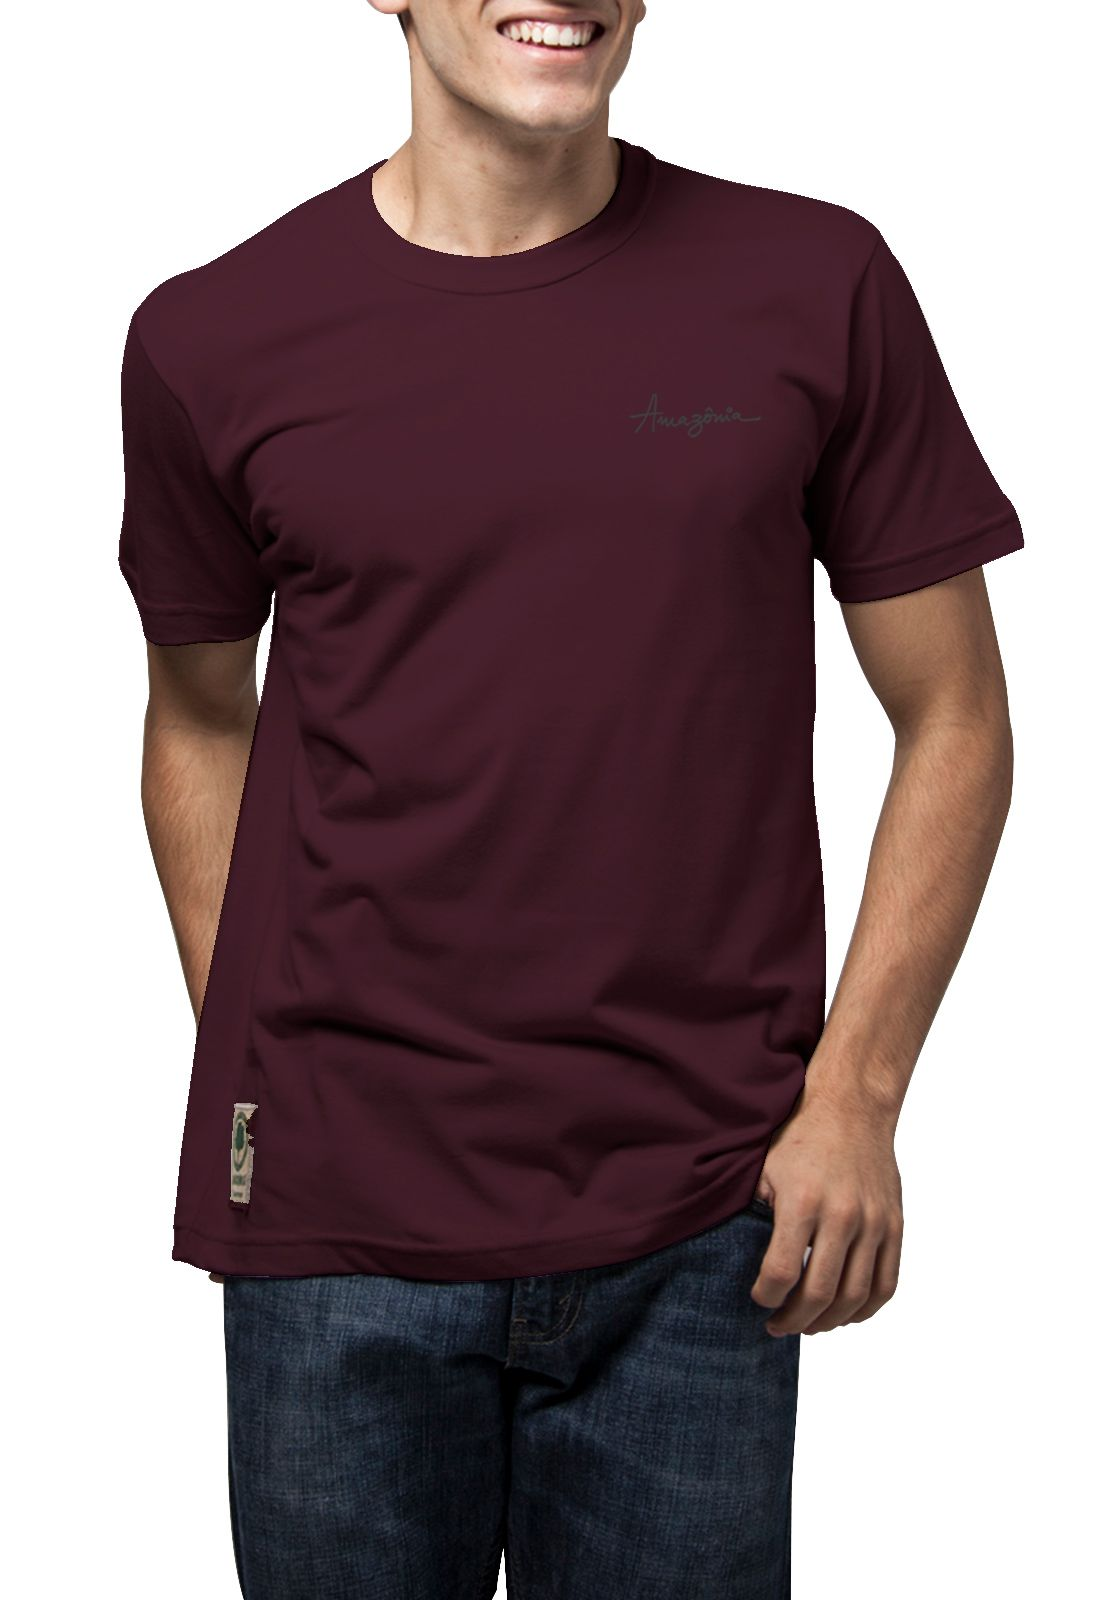 Camiseta Amazônia Big Leaf - Vinho